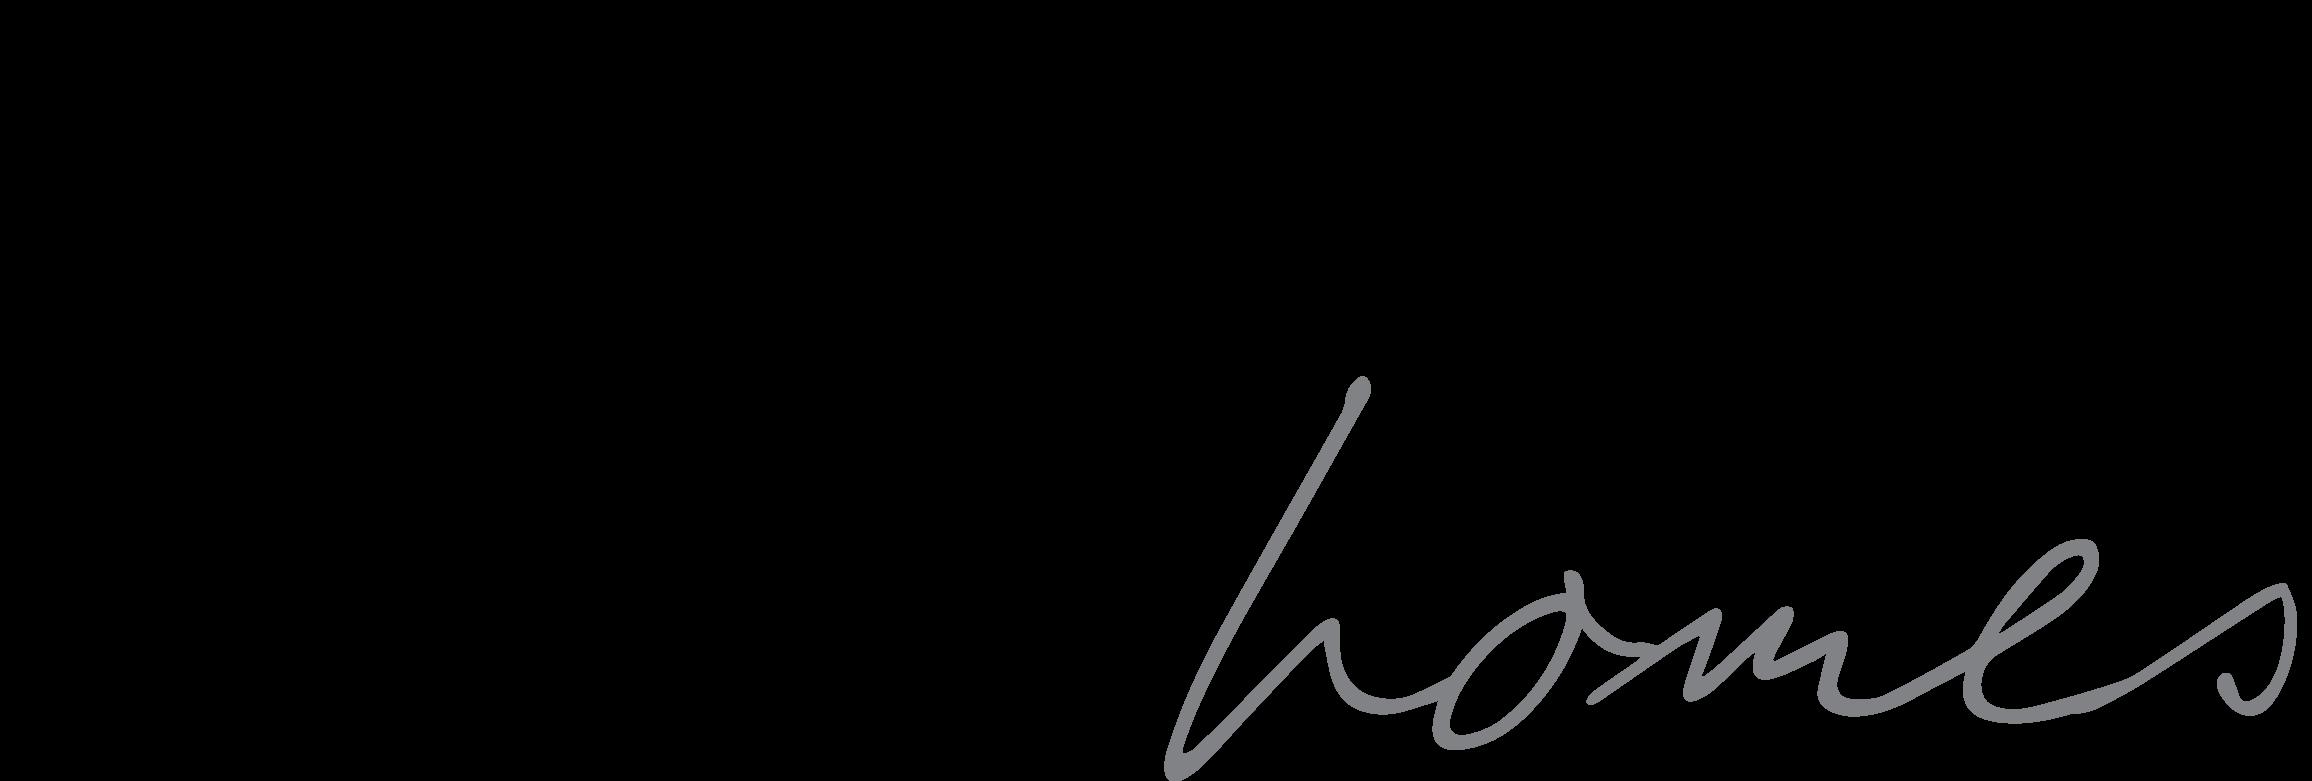 Sendi logo